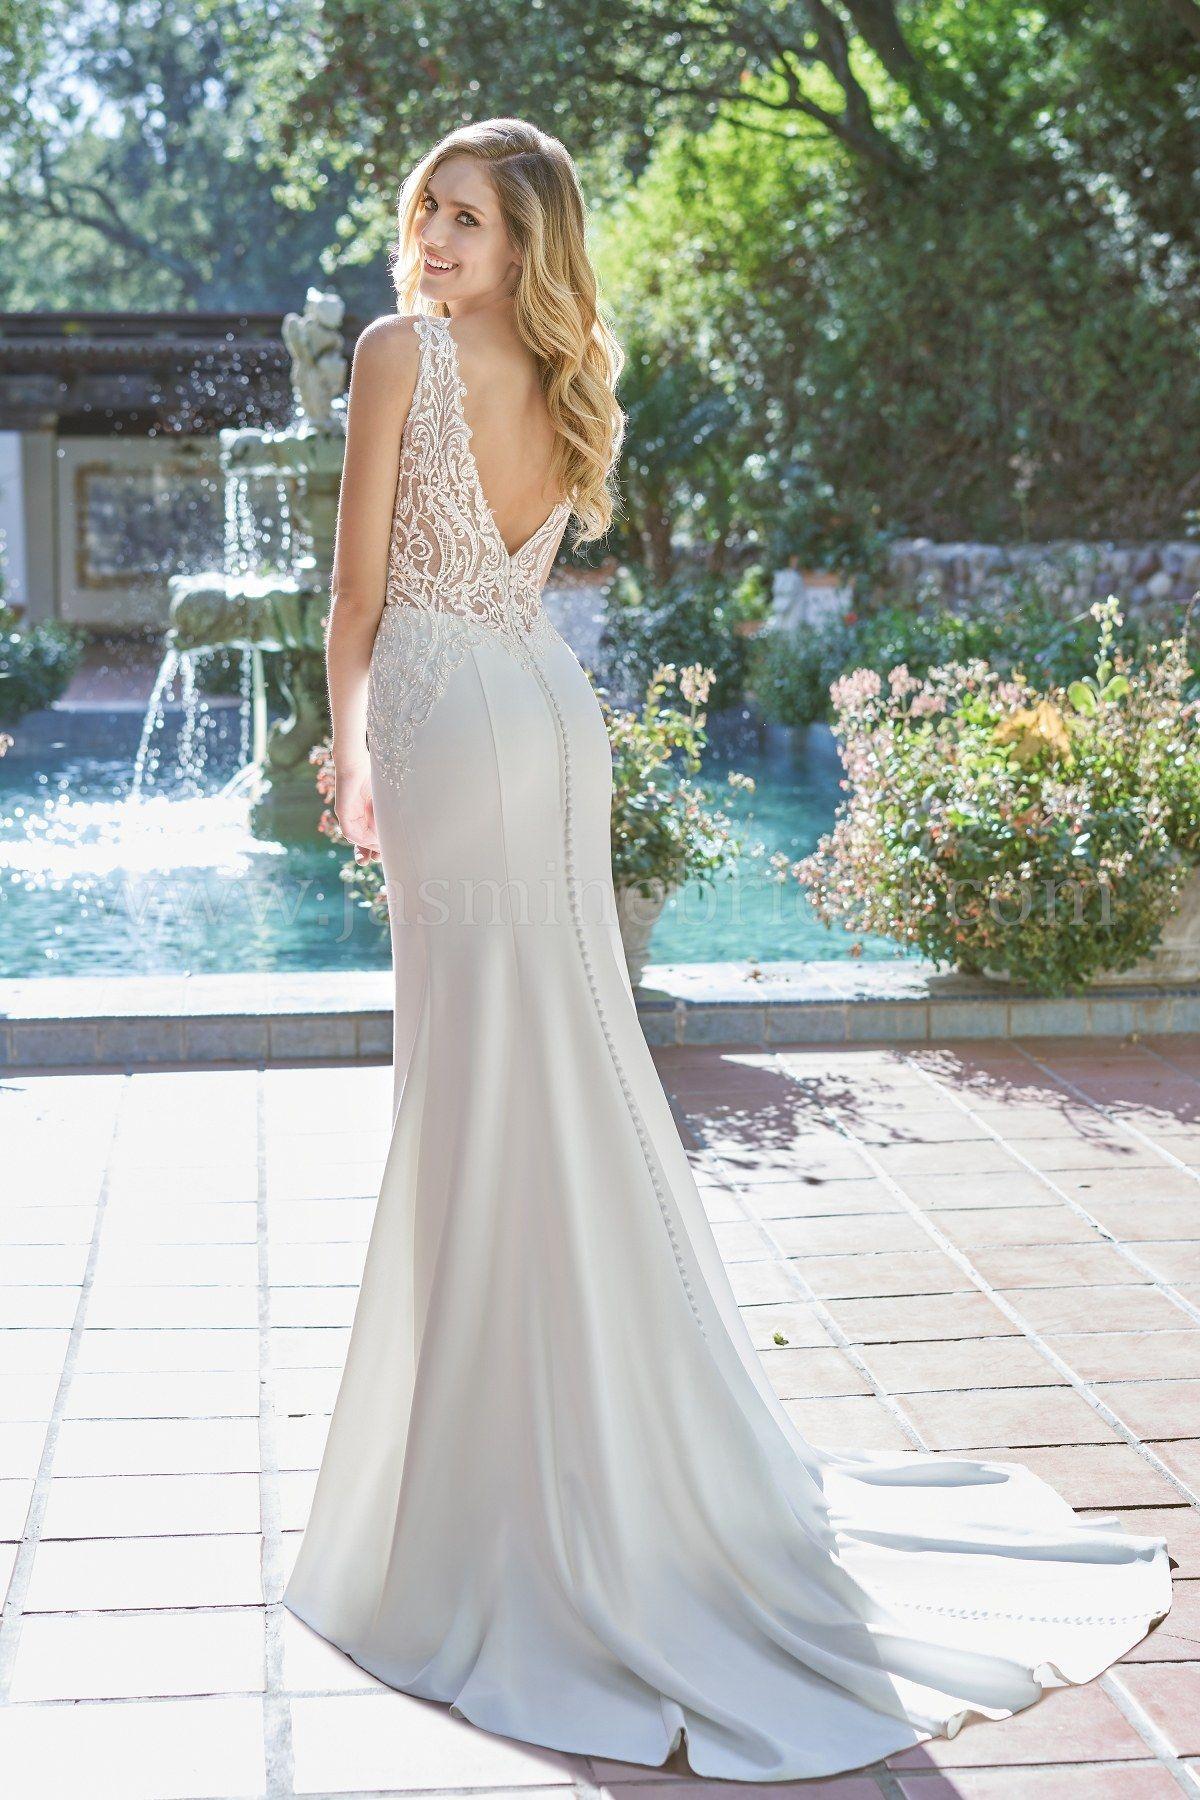 Jasmine wedding dresses  Jasmine Bridal Wedding Dress  Beautiful Wedding Dress  Simple